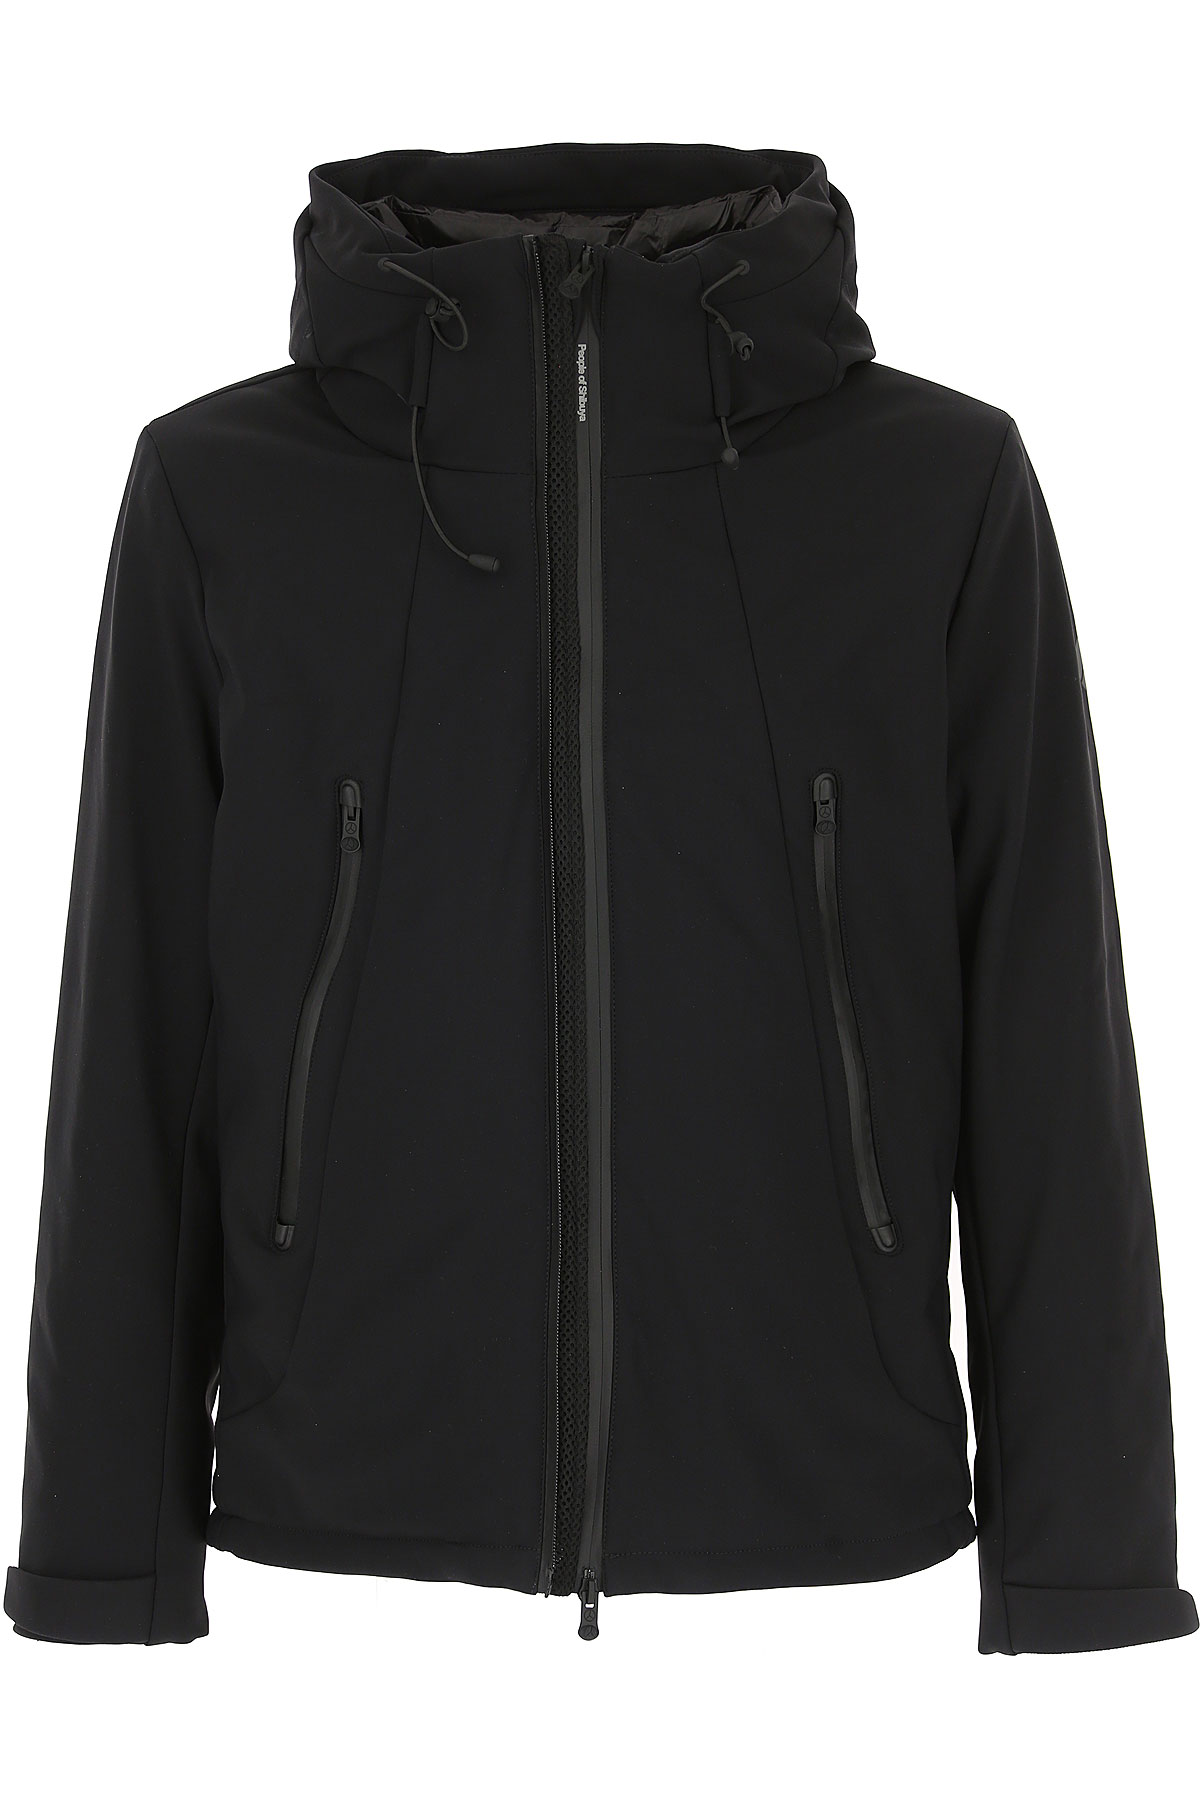 People of Shibuya Down Jacket for Men, Puffer Ski Jacket On Sale, Black, polyamide, 2019, L M S XL XXL